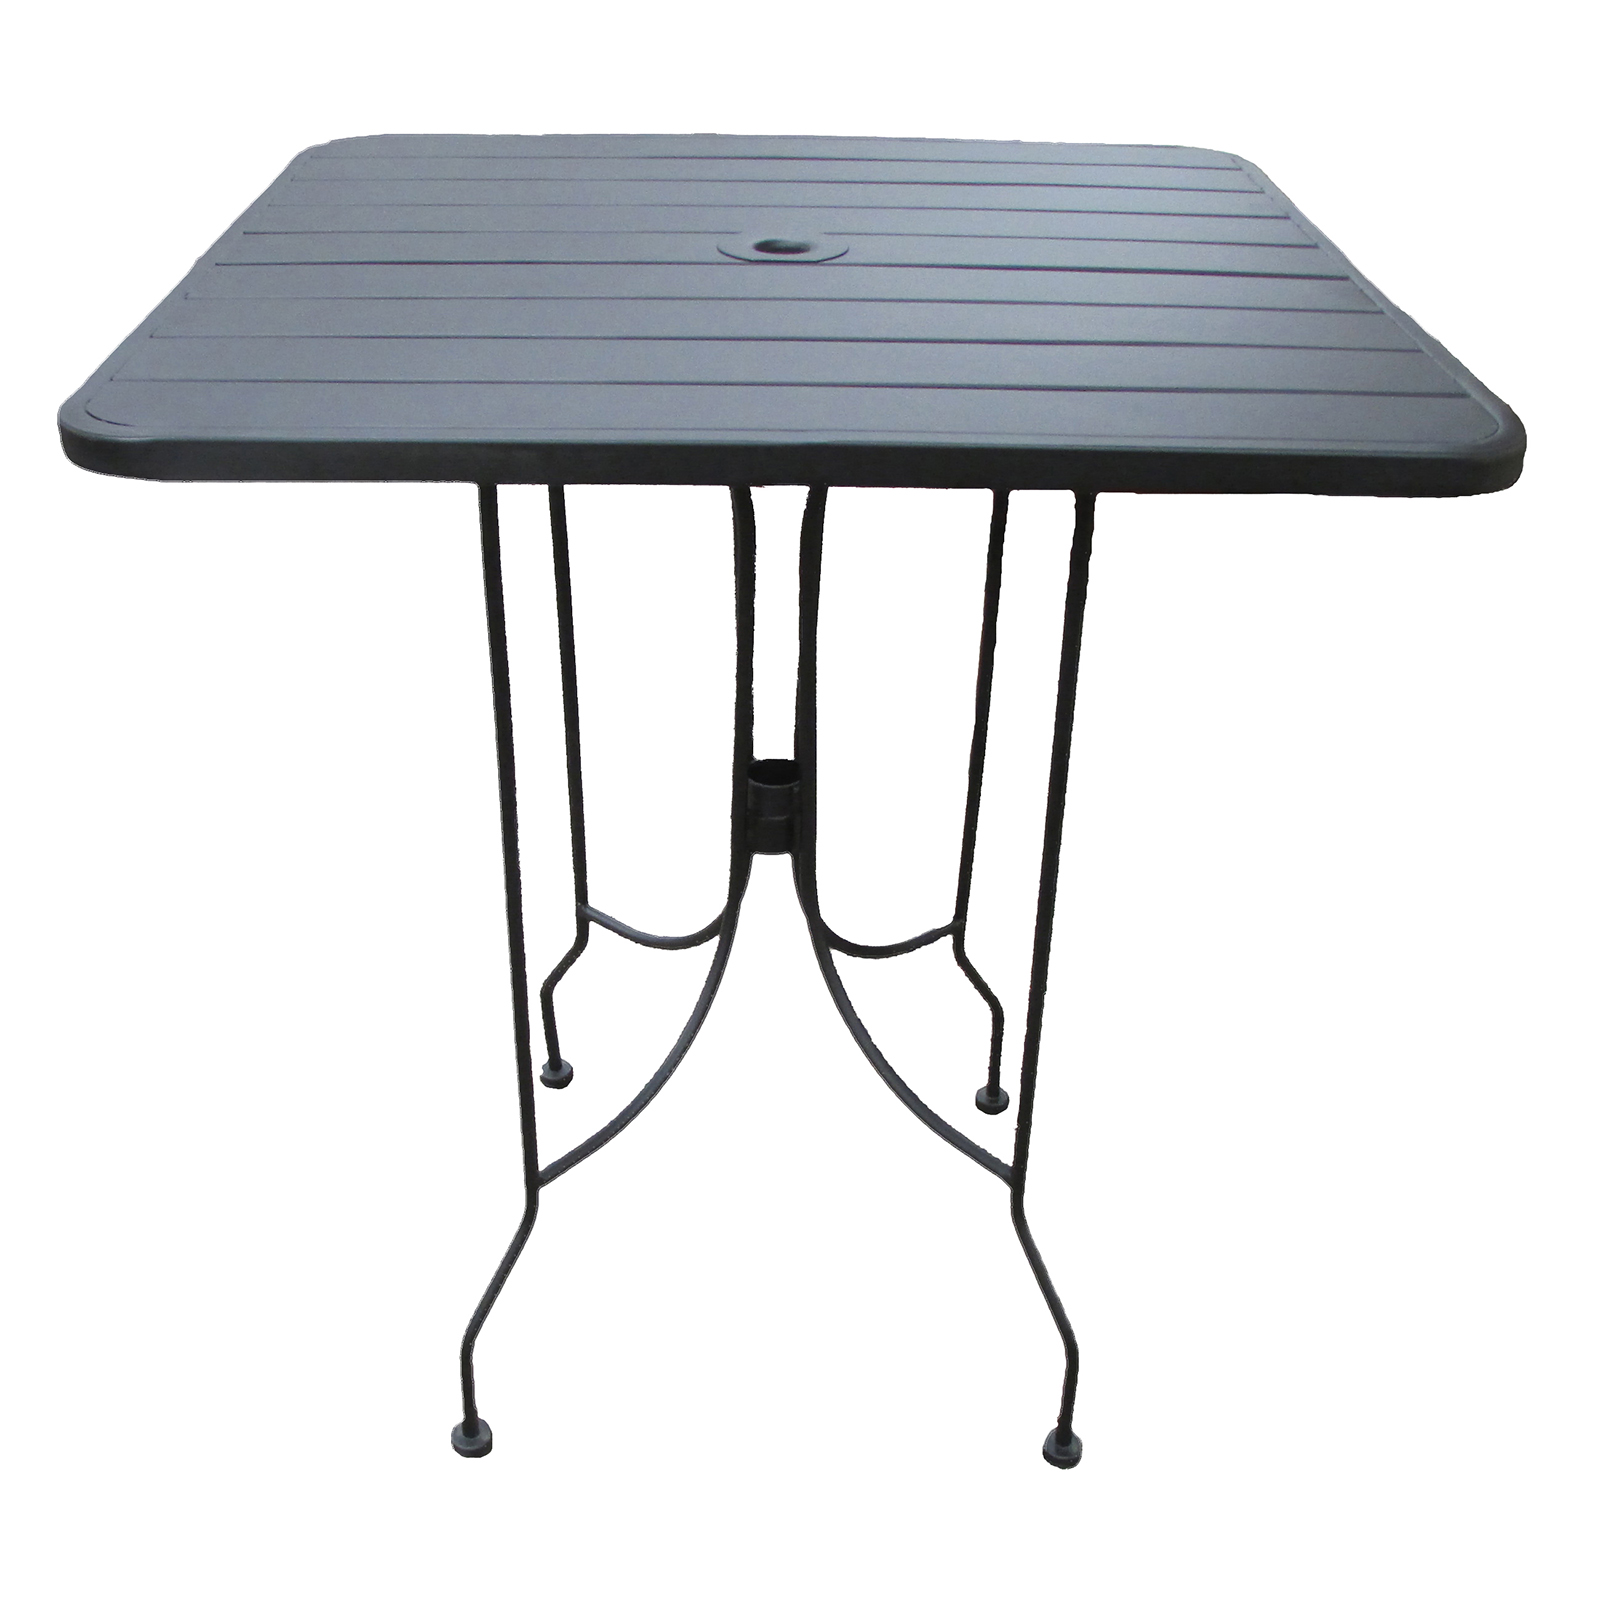 Oak Street OB3030-BAR table, outdoor